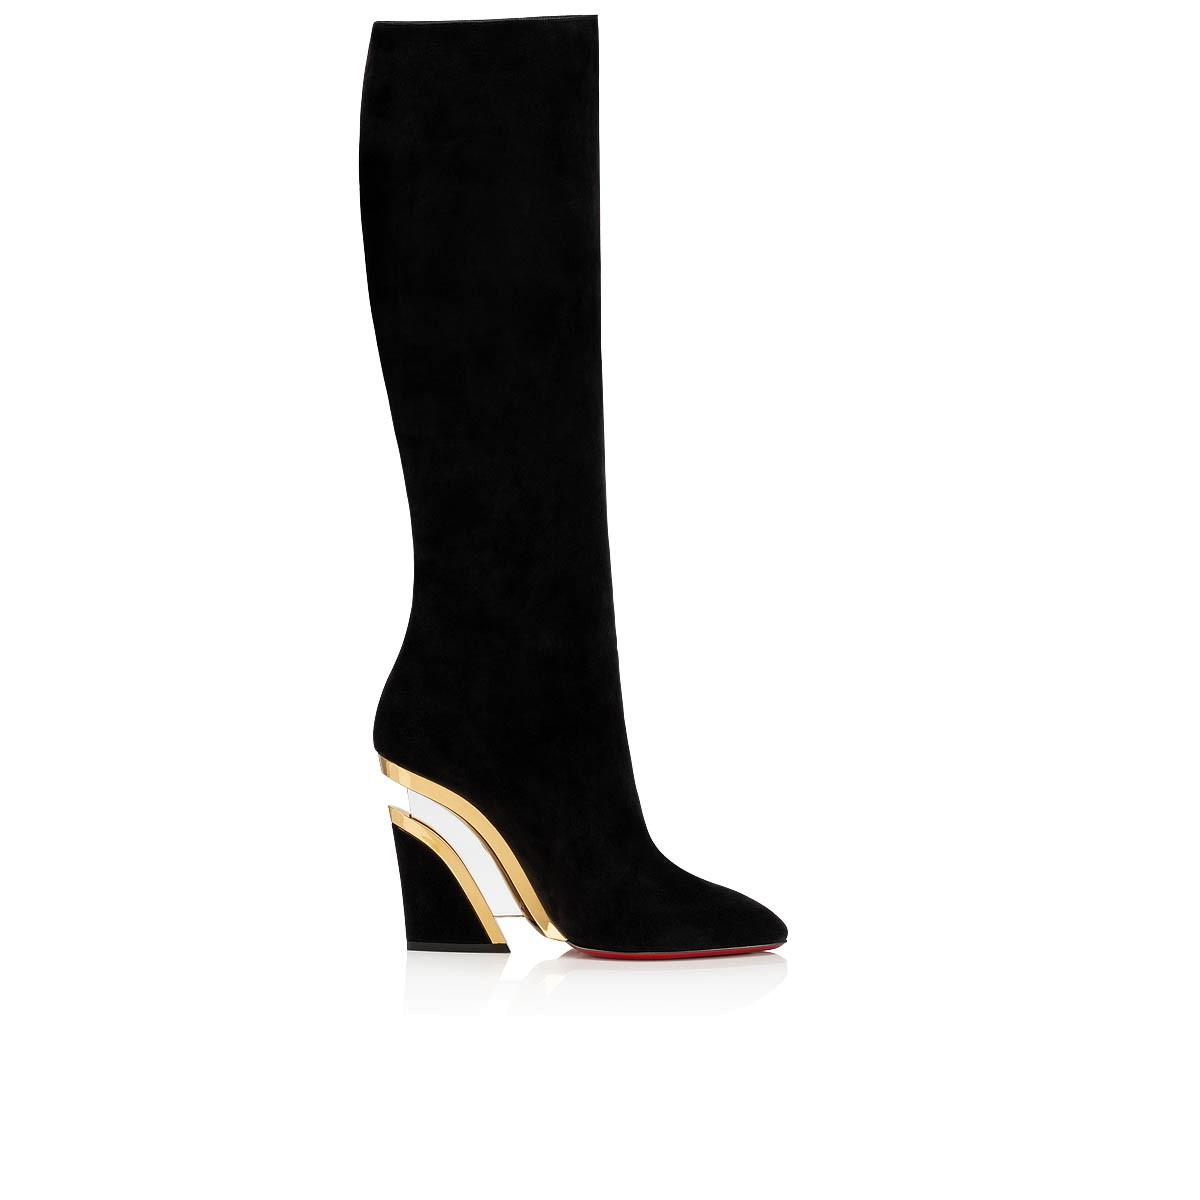 Shoes - Levitibotta - Christian Louboutin